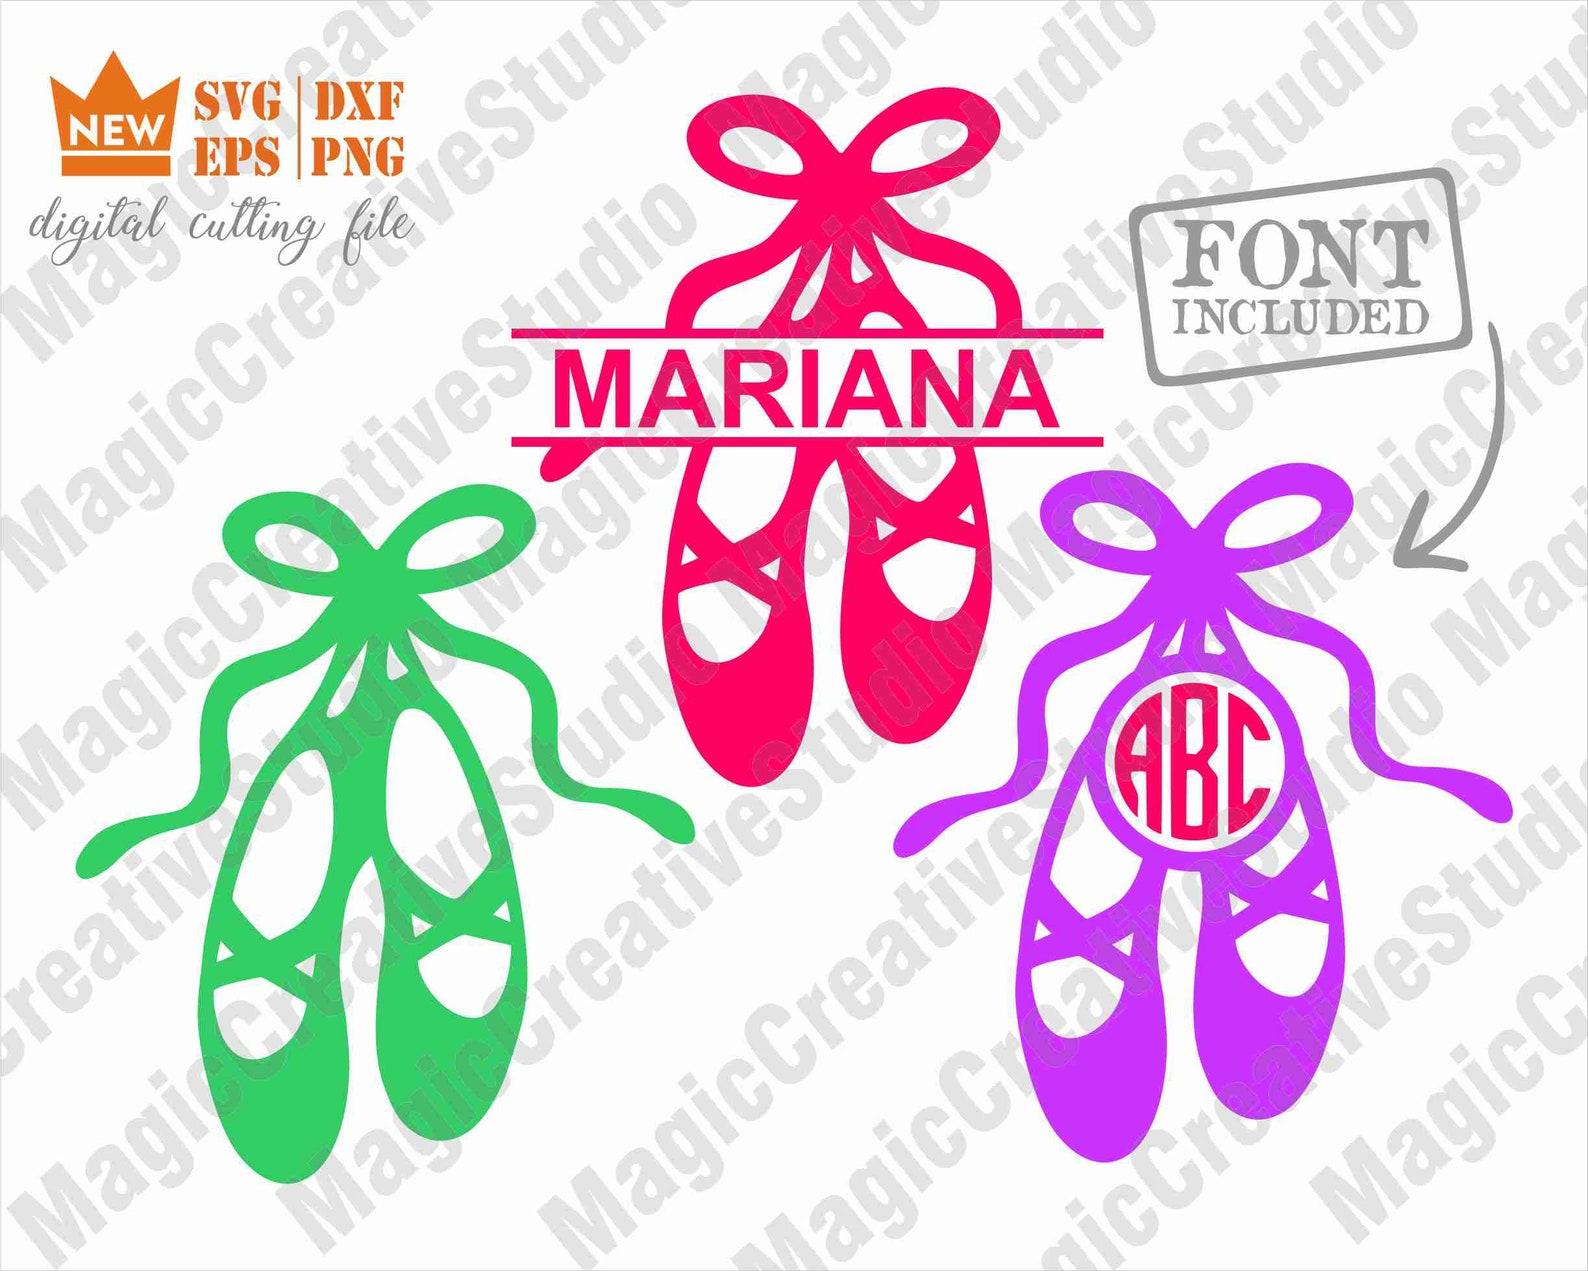 ballet shoes monogram svg / ballerina svg / ballet shoes svg / dance svg / svg, png, dxf, eps files / silhouette cut files, cric